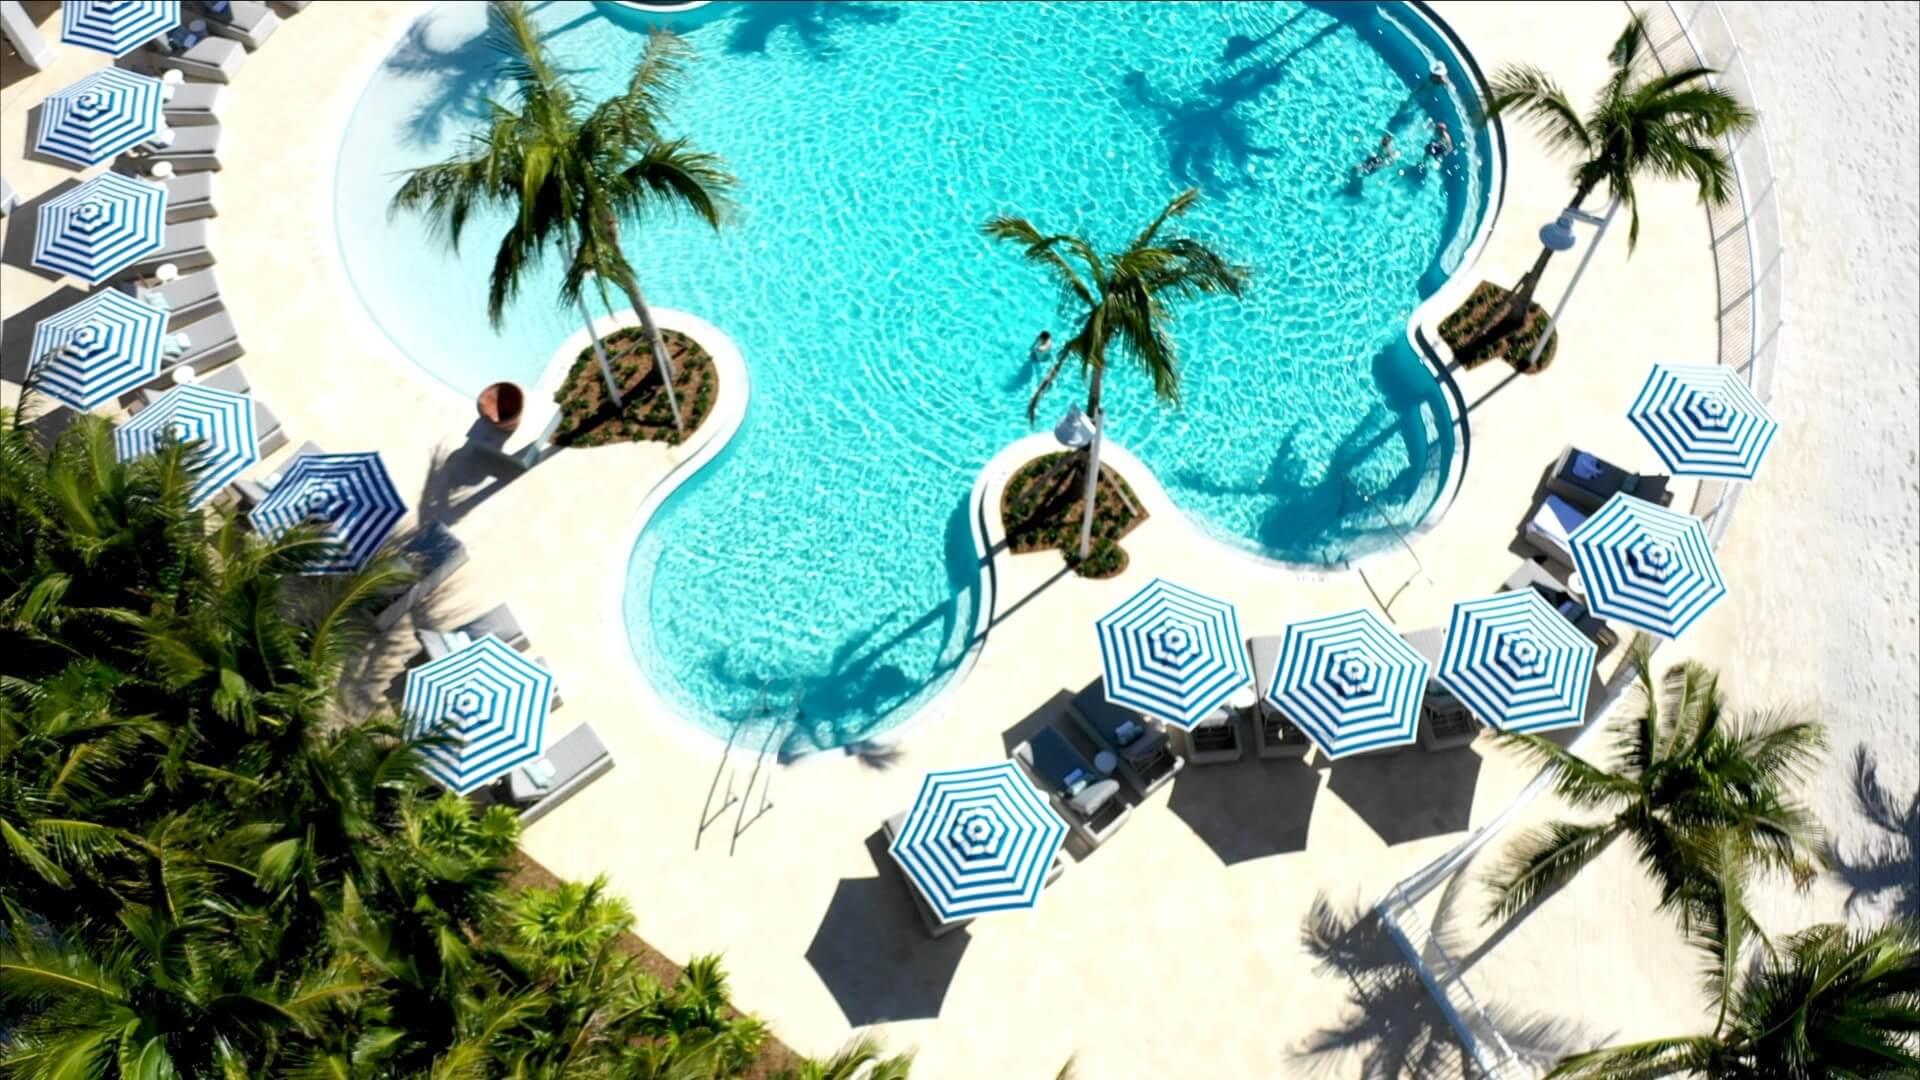 Isla Bella Beach Resort selects the full Cendyn Hospitality Cloud portfolio